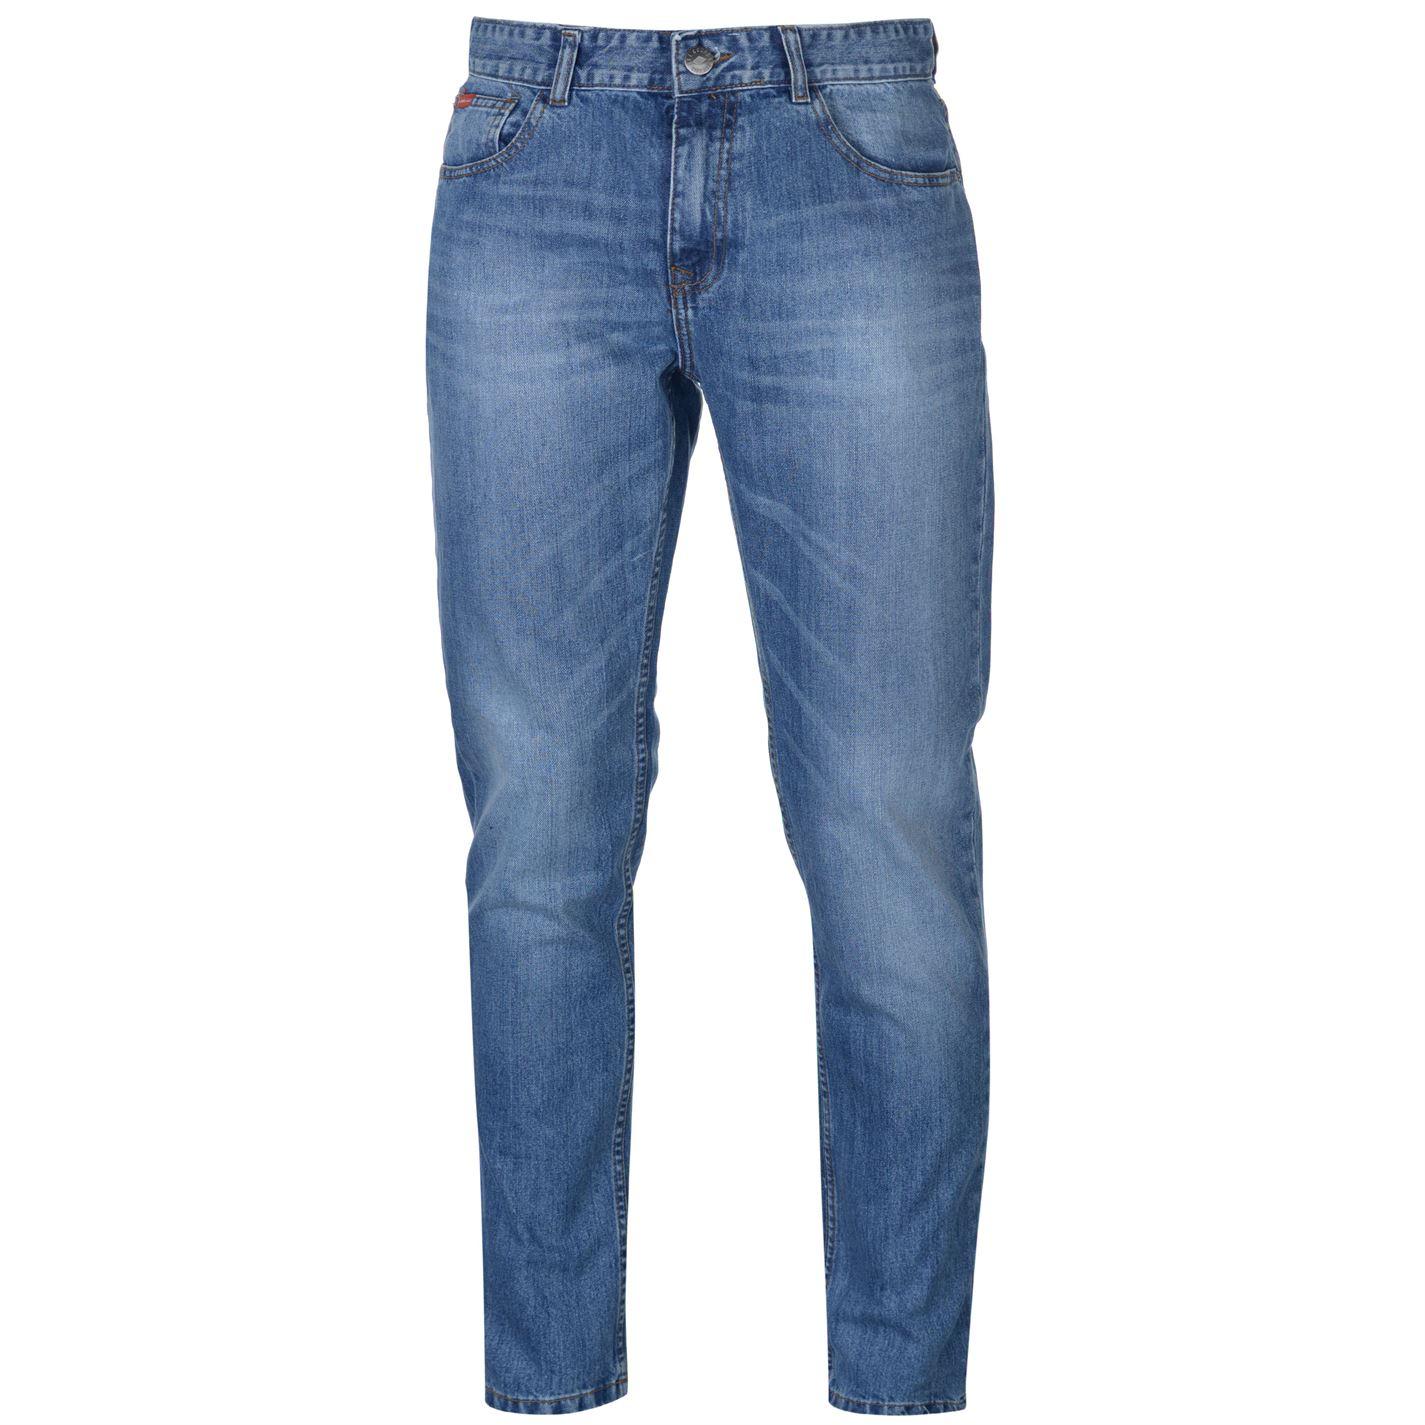 Lee Cooper Slim Leg Jeans pánské Light Stone - Glami.sk f99650922c